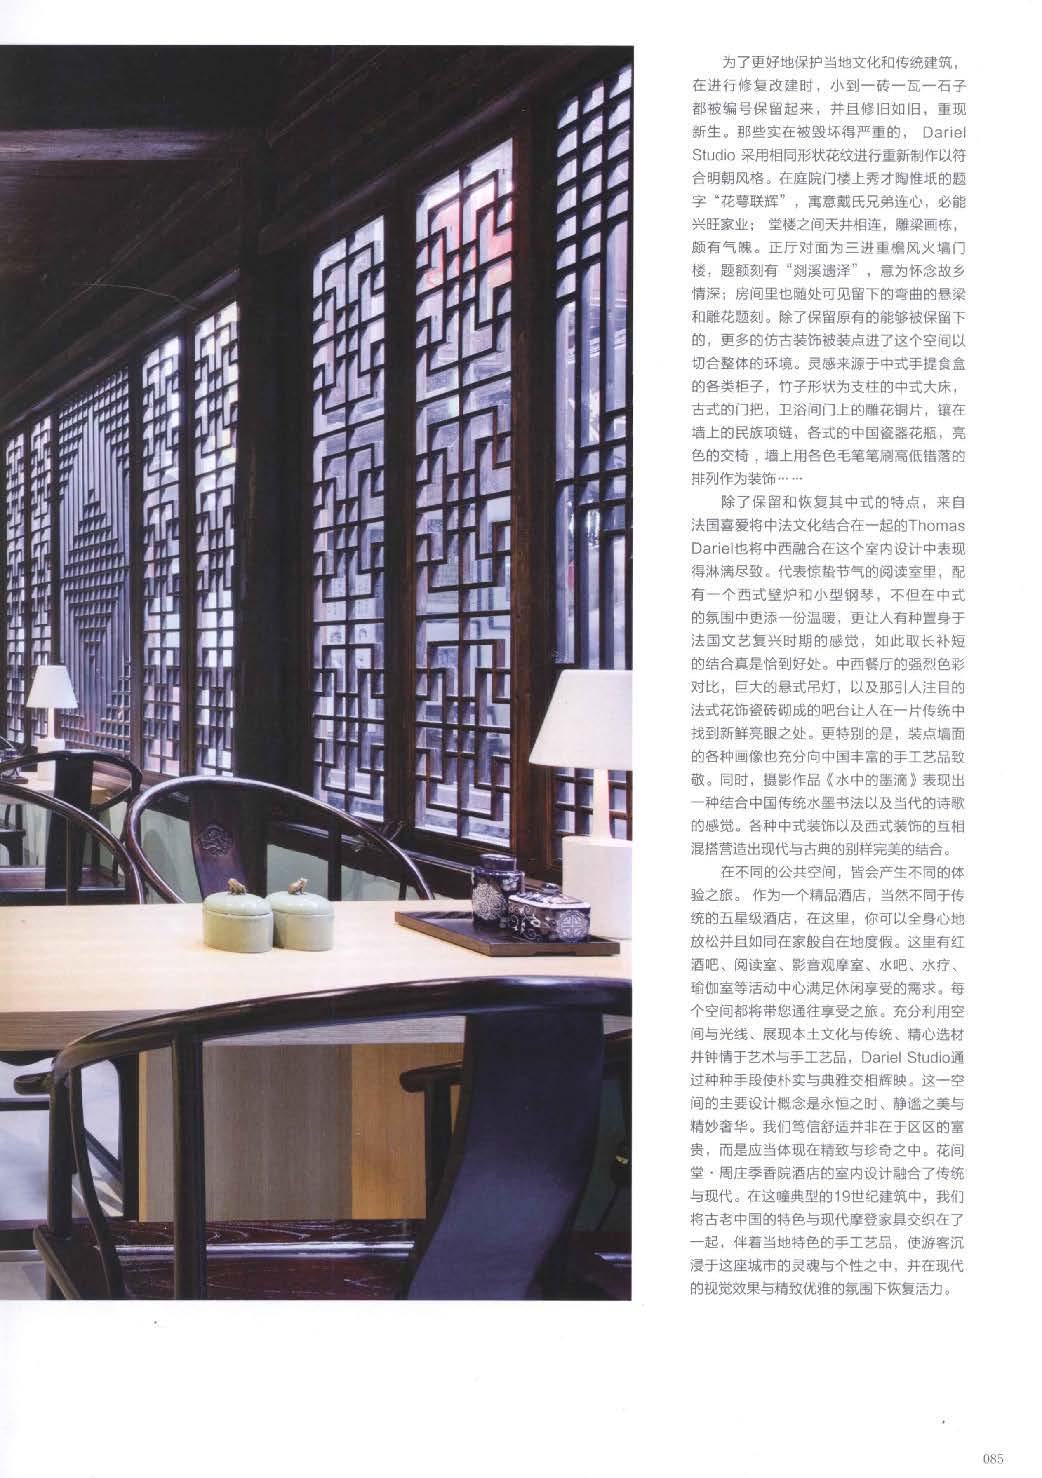 H073 东方风情 会所、餐饮细部解析_Page_083.jpg